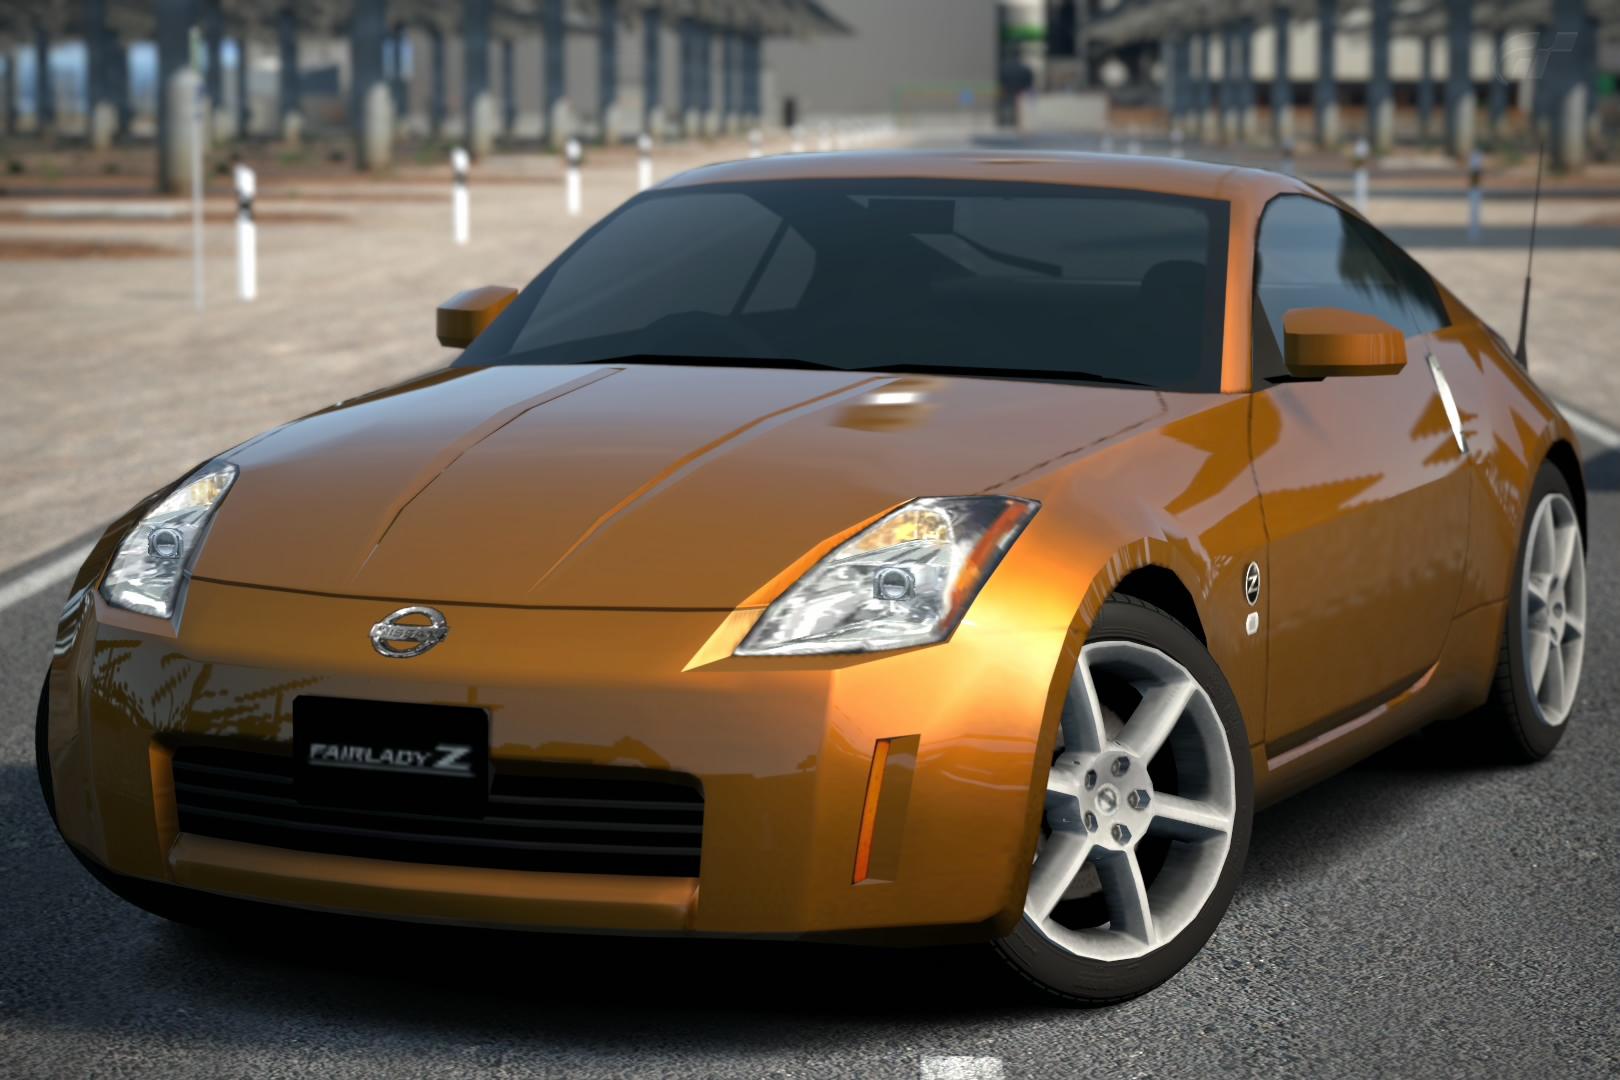 Nissan Fairlady Z Version S Z33 02 Gran Turismo Wiki